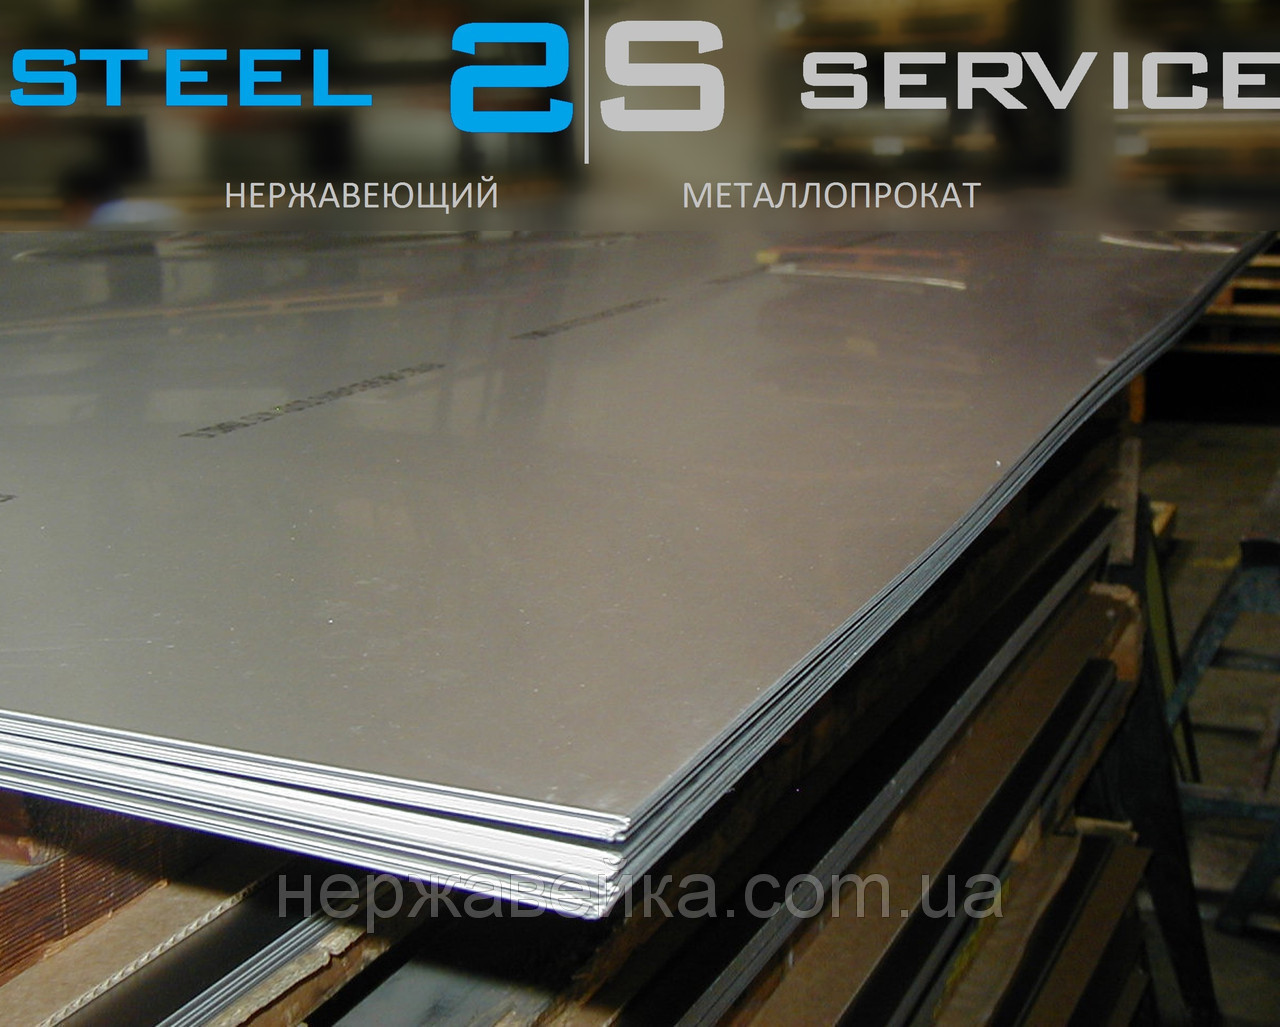 Нержавеющий лист 1х1000х2000мм  AISI 316L(03Х17Н14М3) BA - зеркало,  кислотостойкий